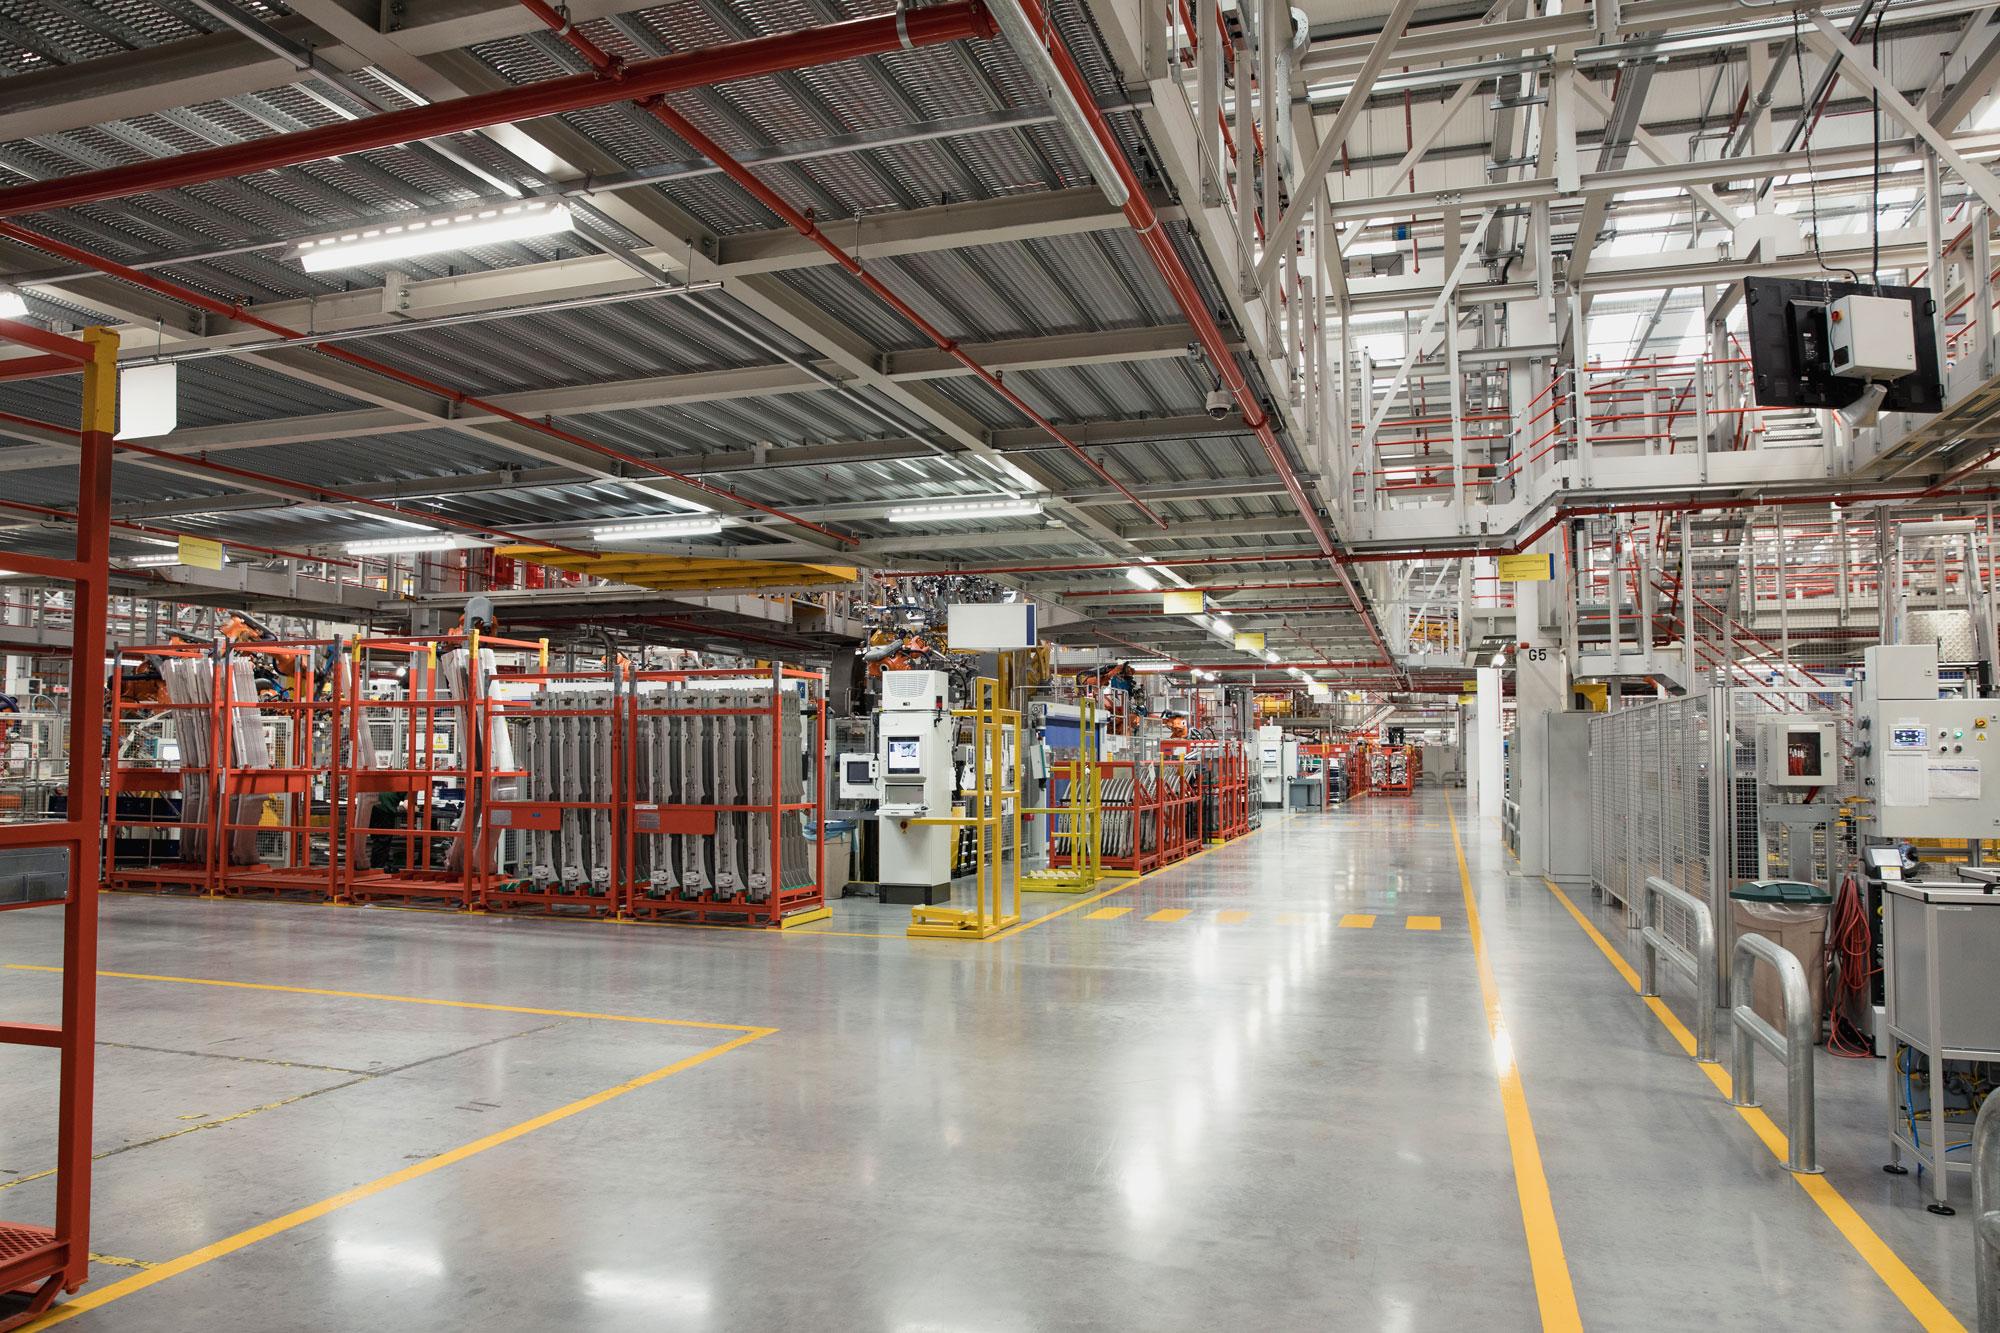 manufacturing-iStock-861221742.jpg